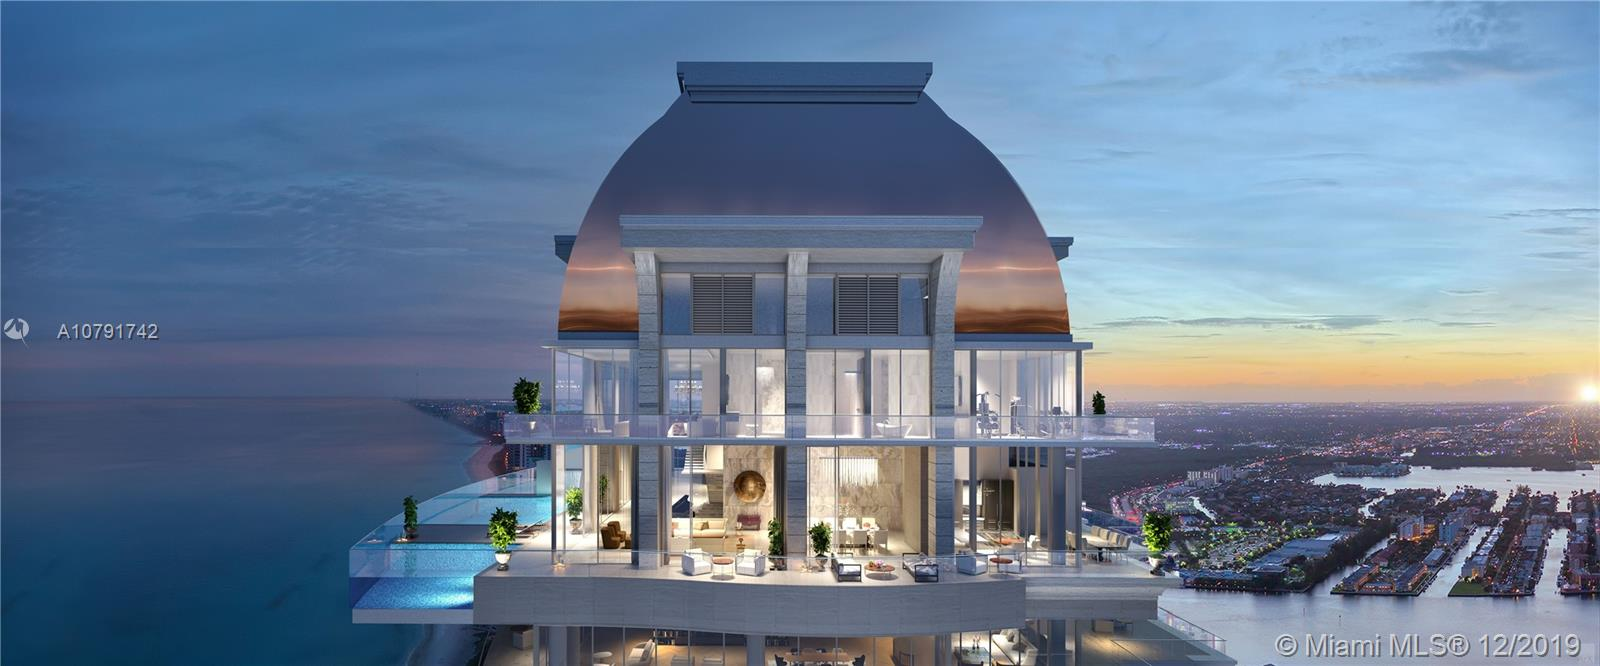 17901 Collins Ave, Unit #PH01 Luxury Real Estate